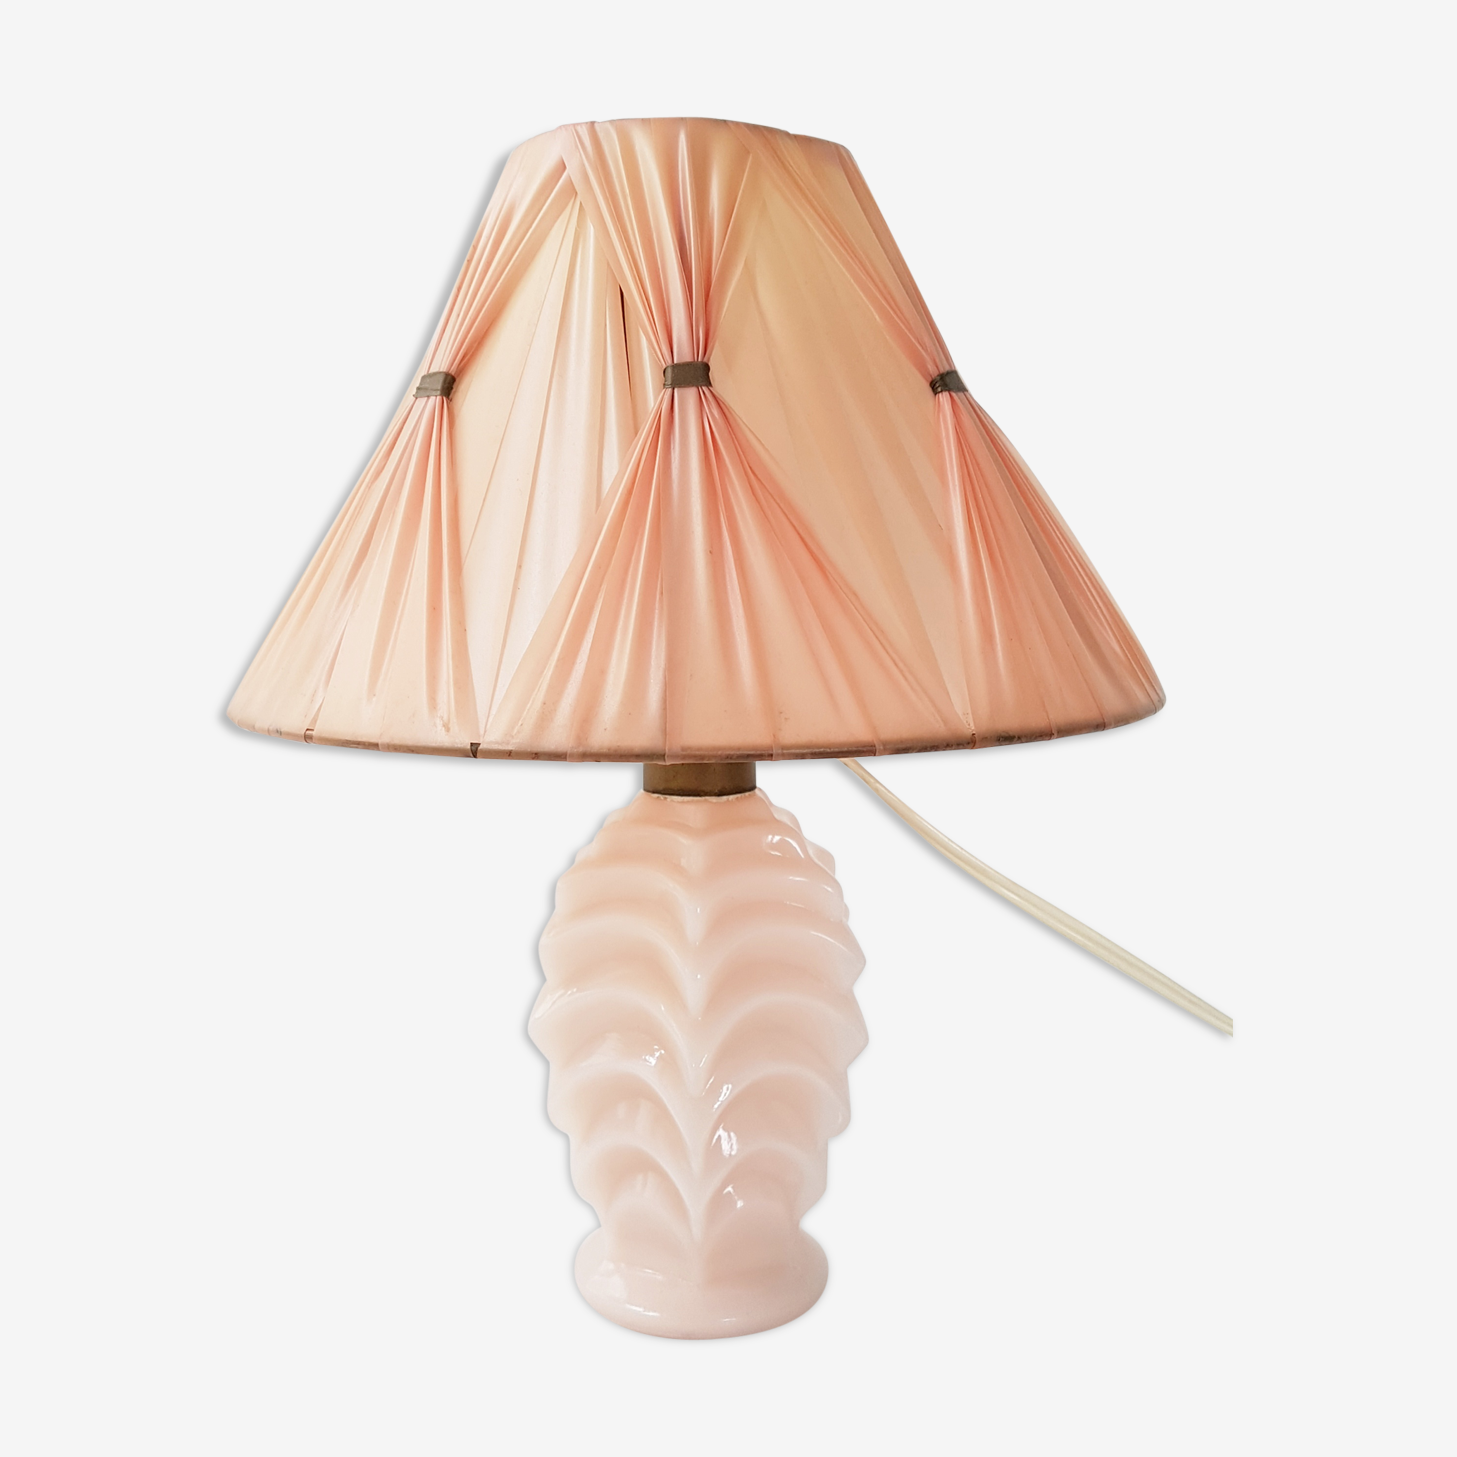 1950 glass bedside lamp